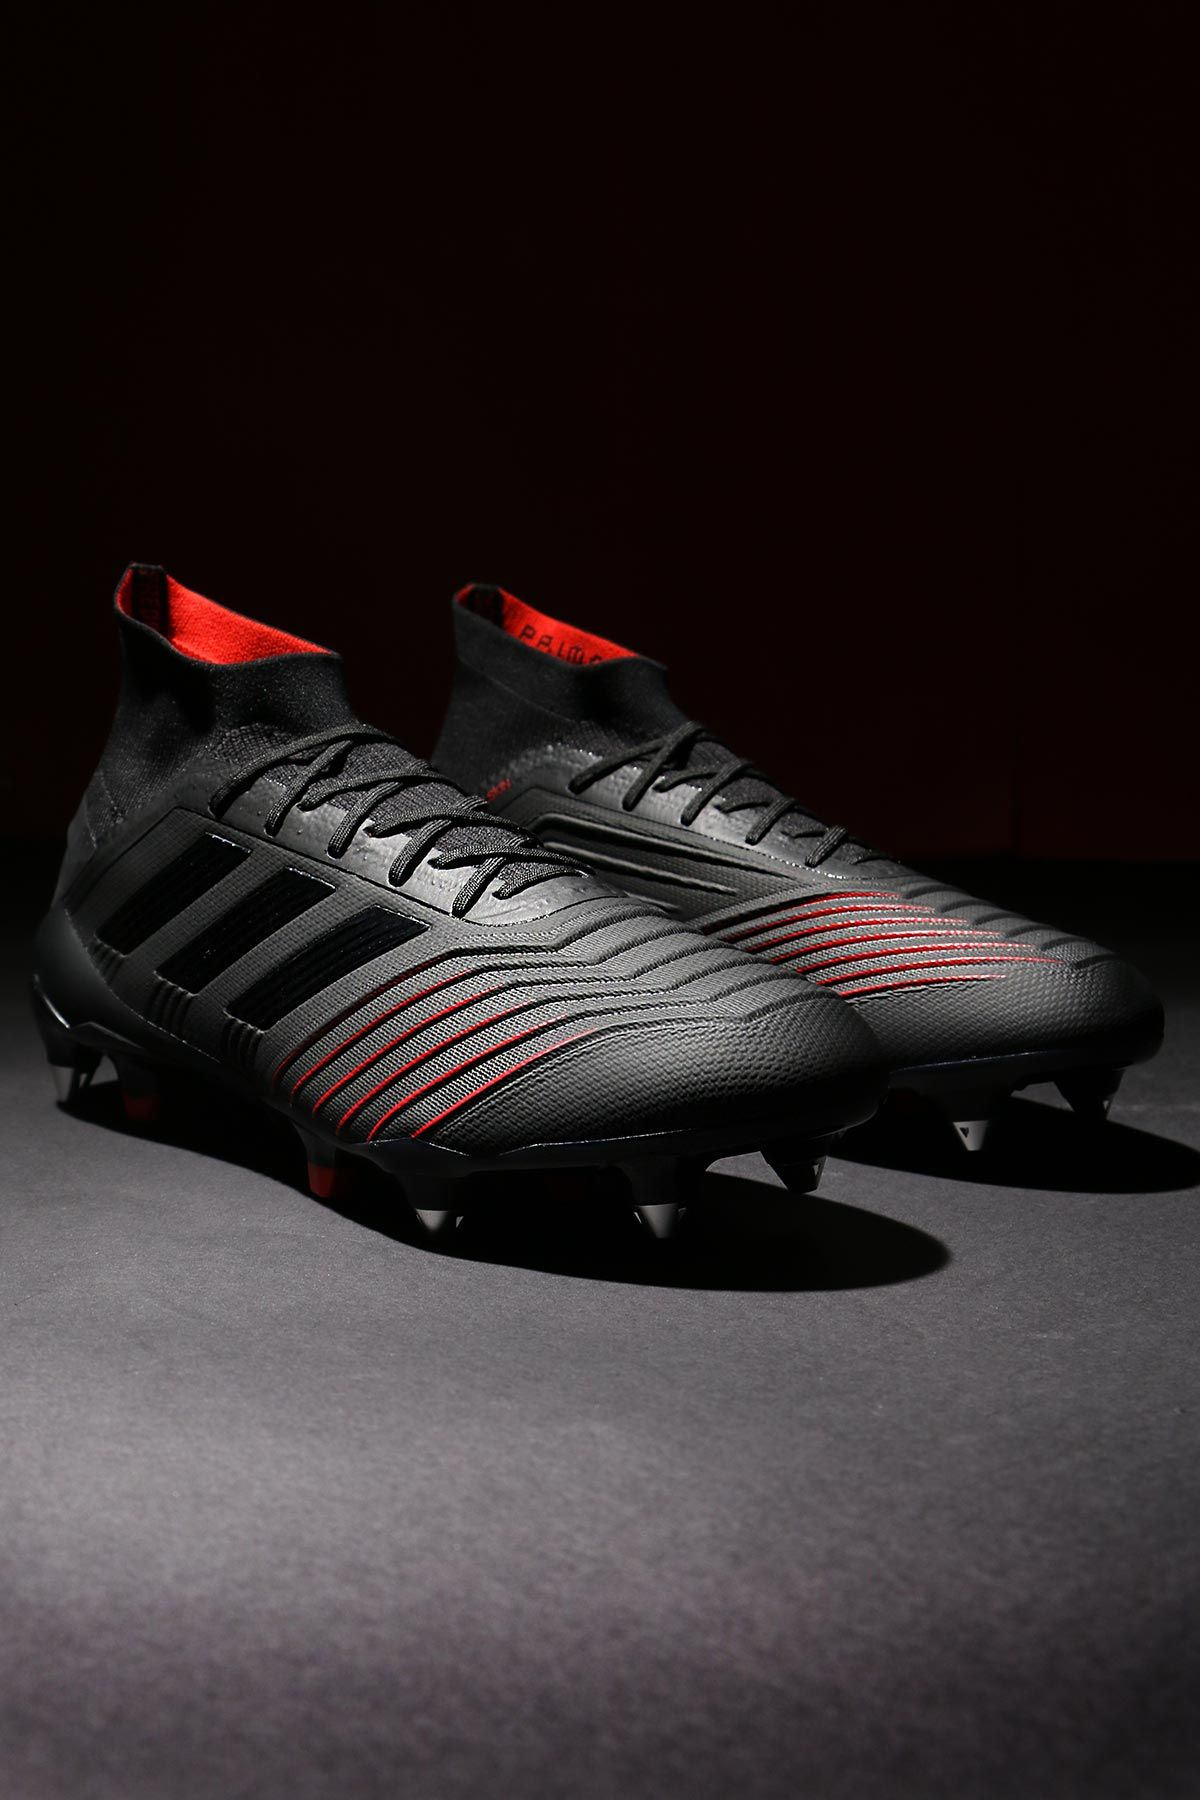 timeless design 547c6 d1468 Botas de fútbol con tobillera adidas SG para césped natural húmedo - negras